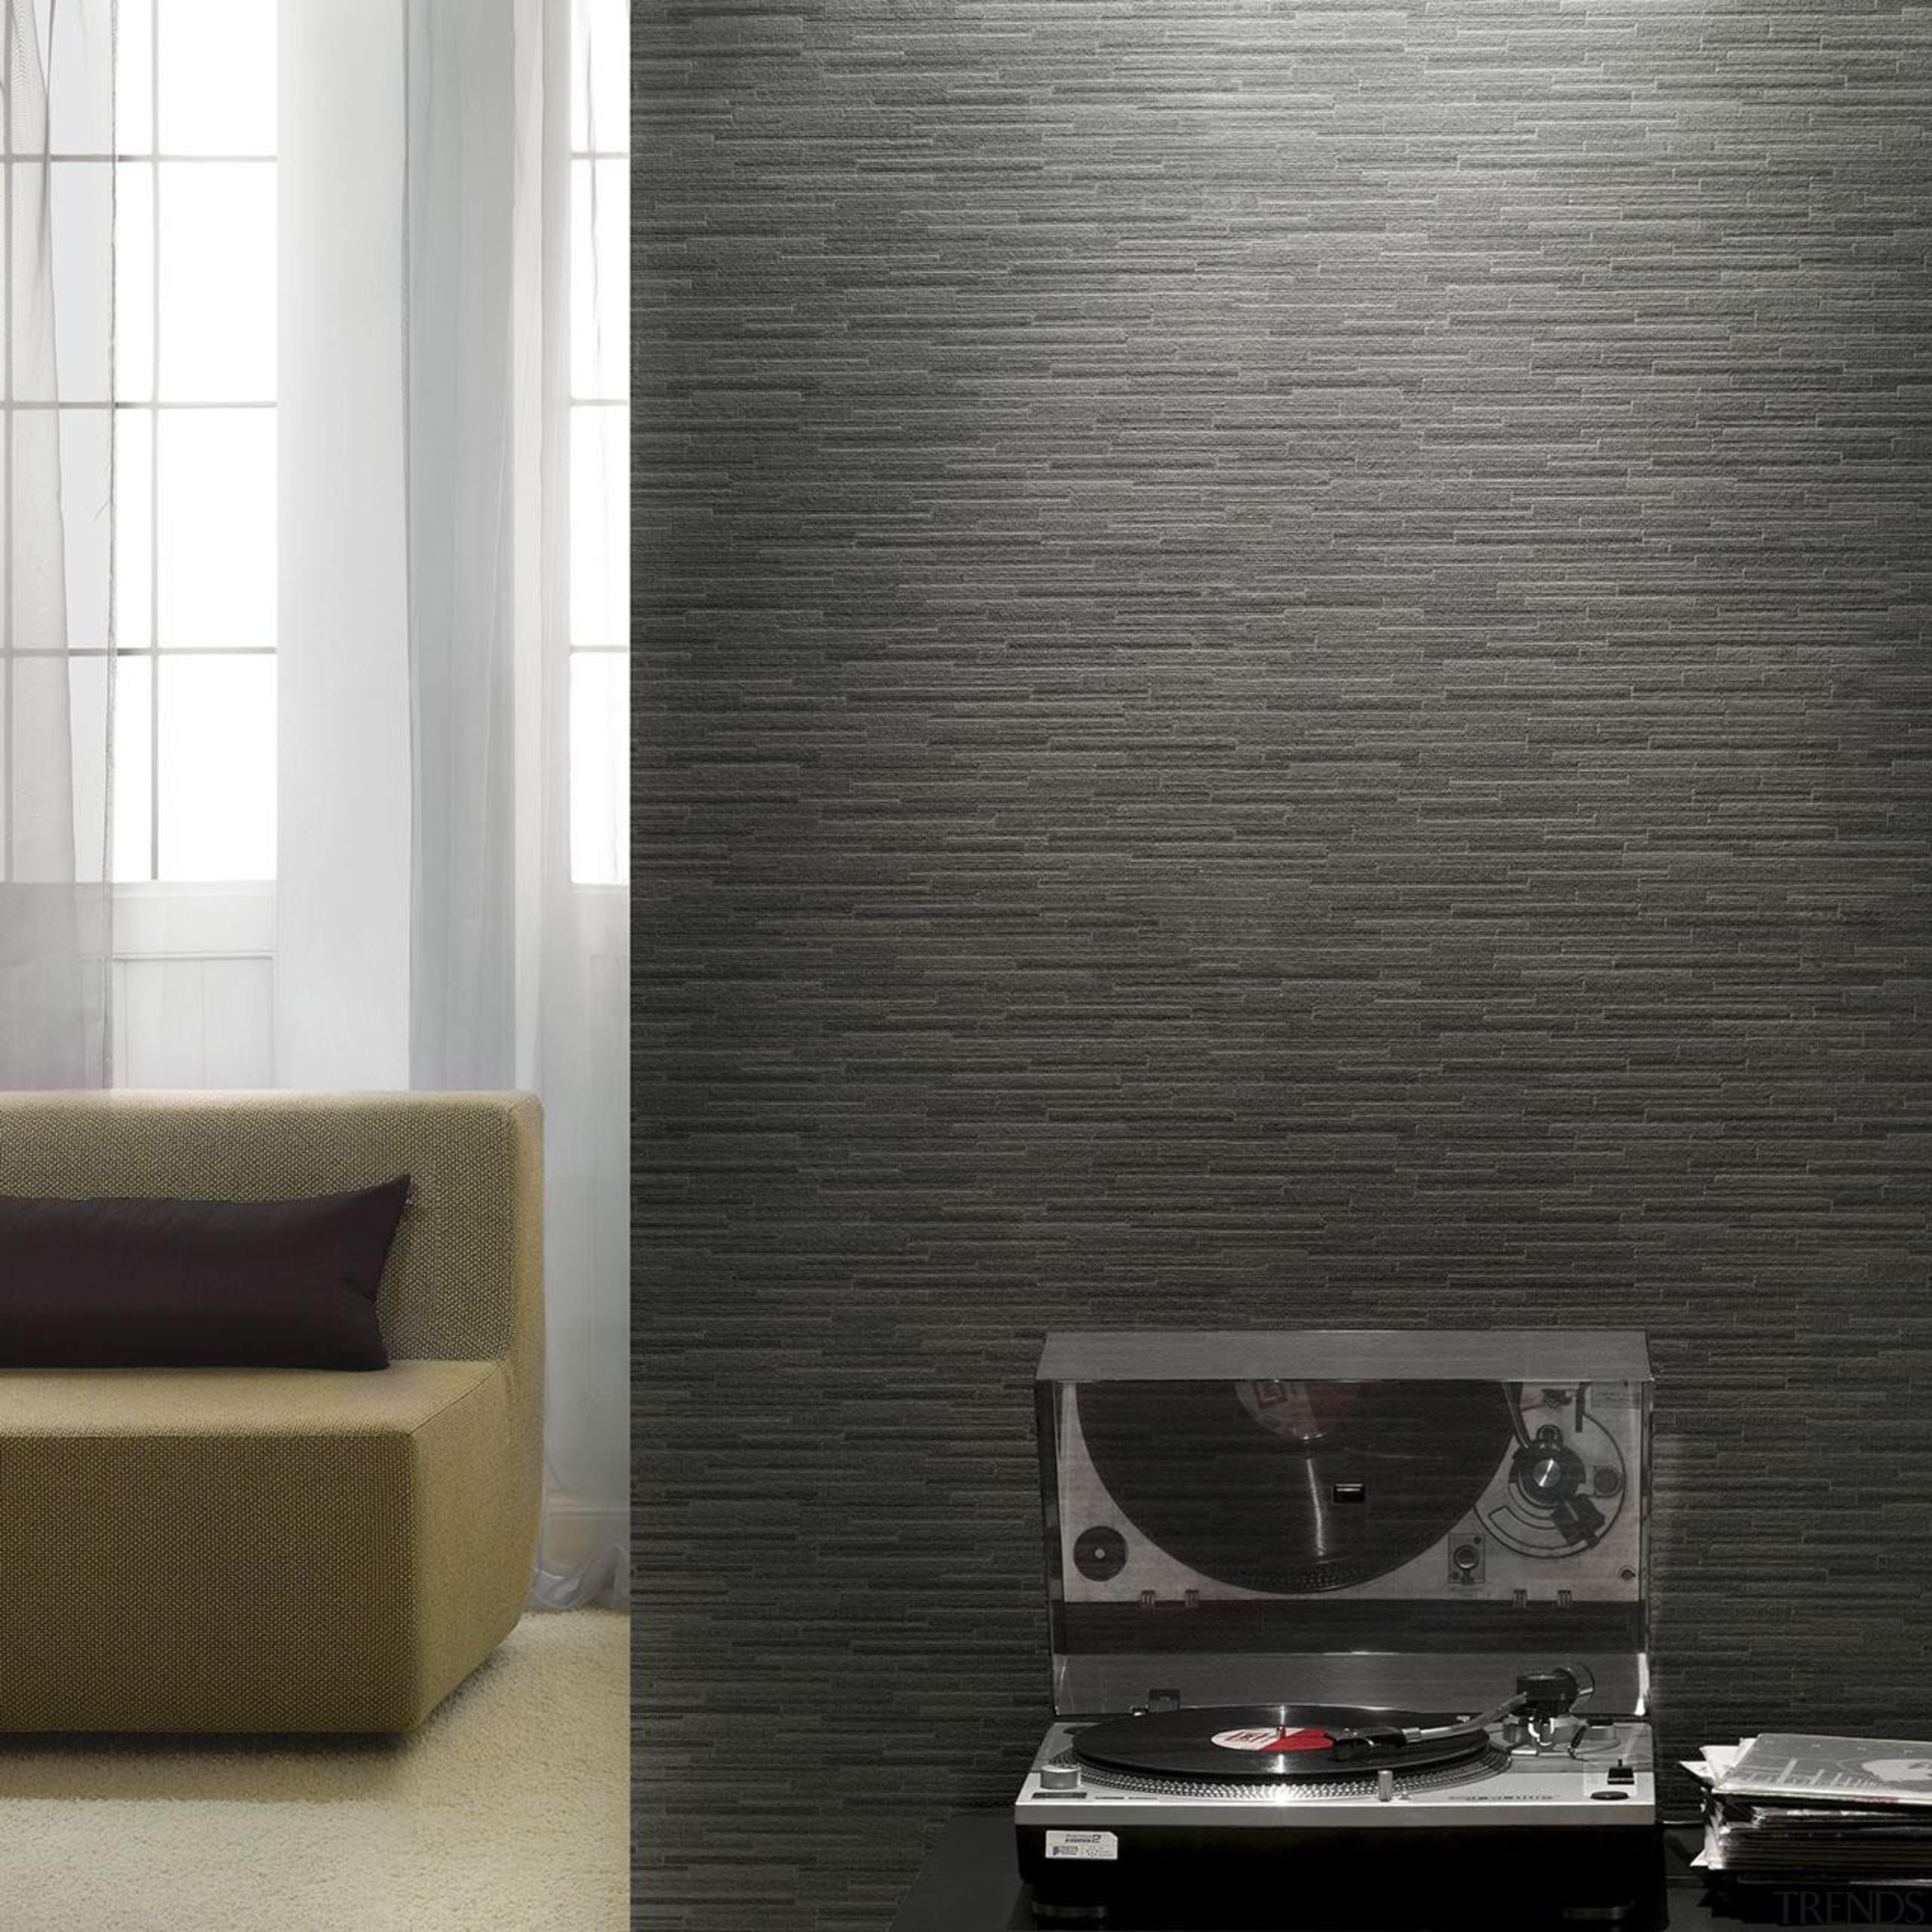 Modern Style Range - floor | flooring | floor, flooring, interior design, product design, tile, wall, wallpaper, black, gray